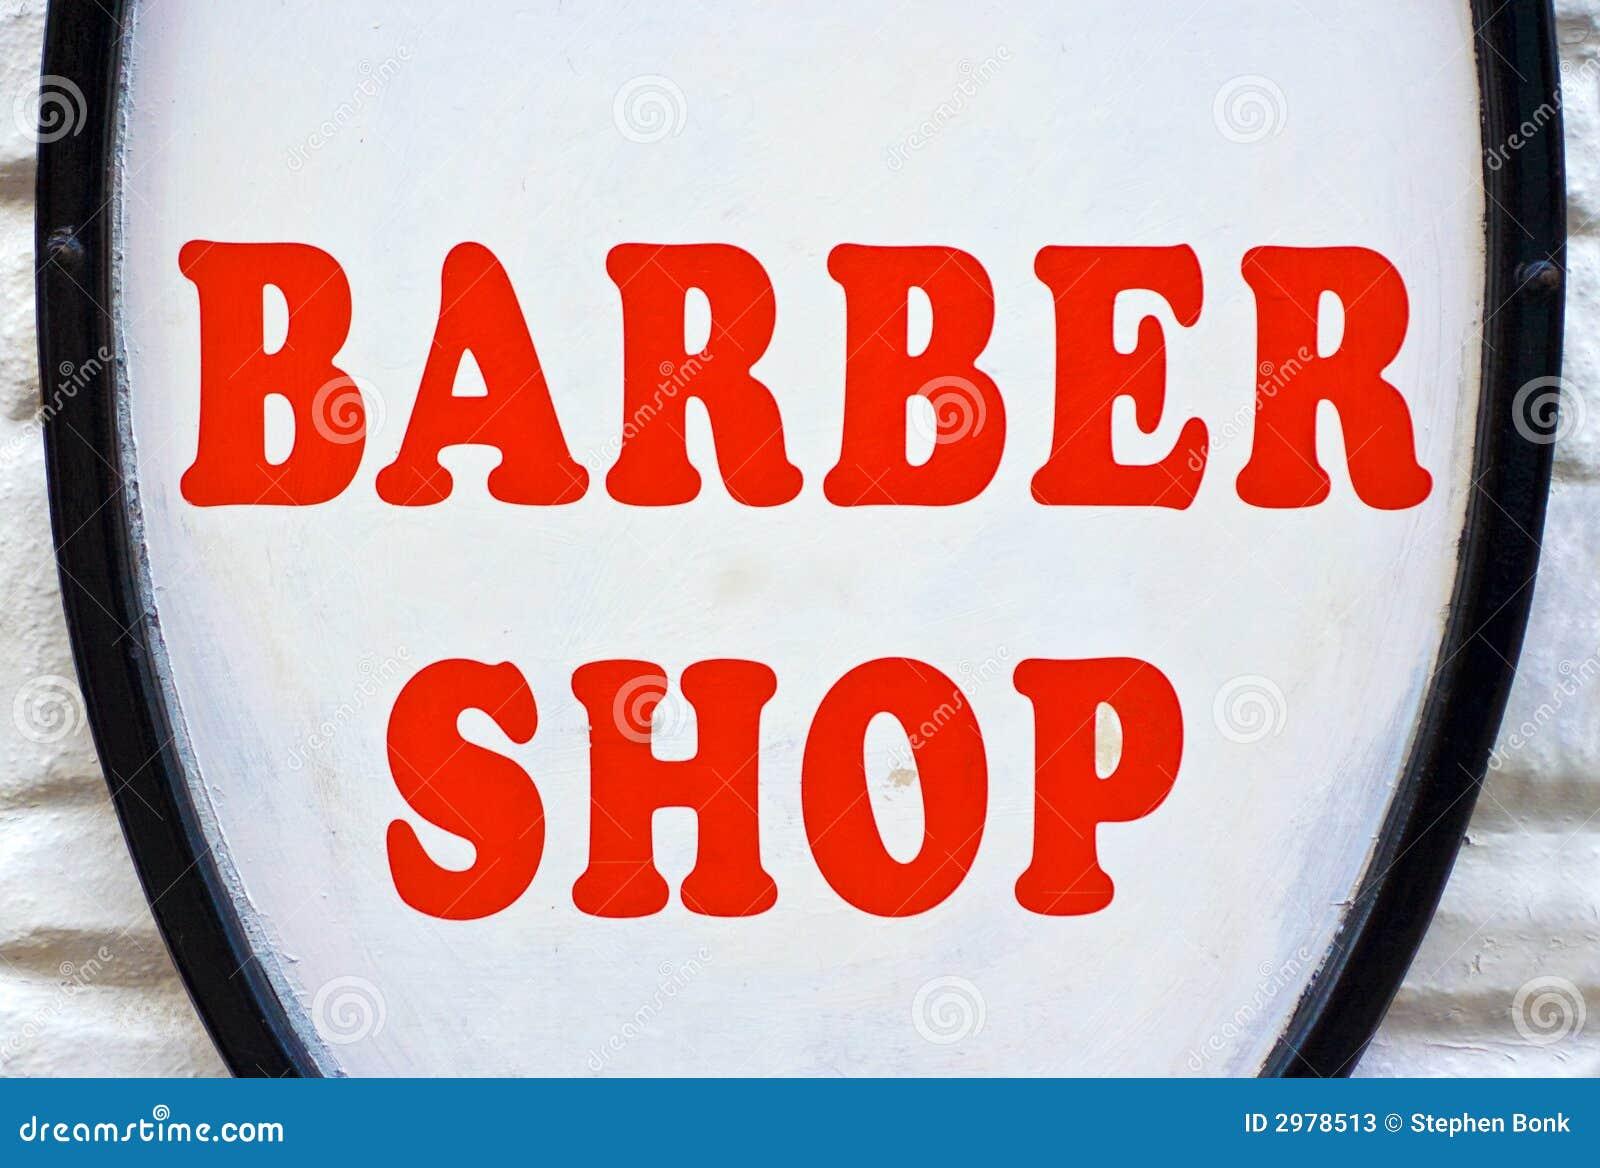 barber shop sign stock photos image 2978513 barber clip art black and white barber clip art black and white